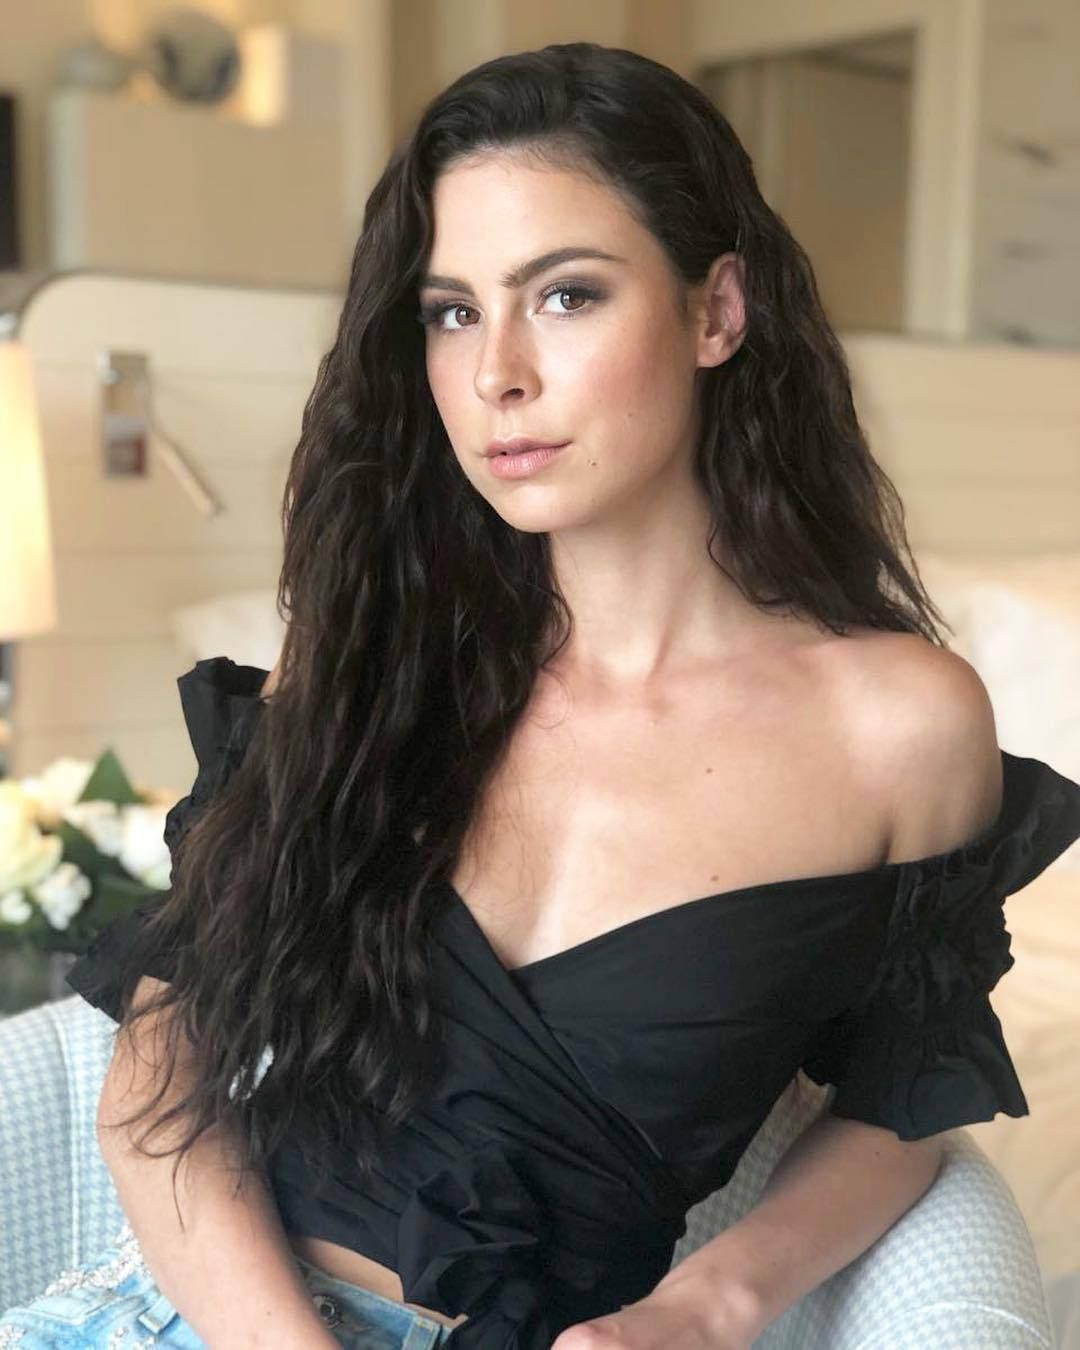 2019 Lena Meyer-Landrut nudes (48 foto and video), Ass, Paparazzi, Twitter, panties 2019